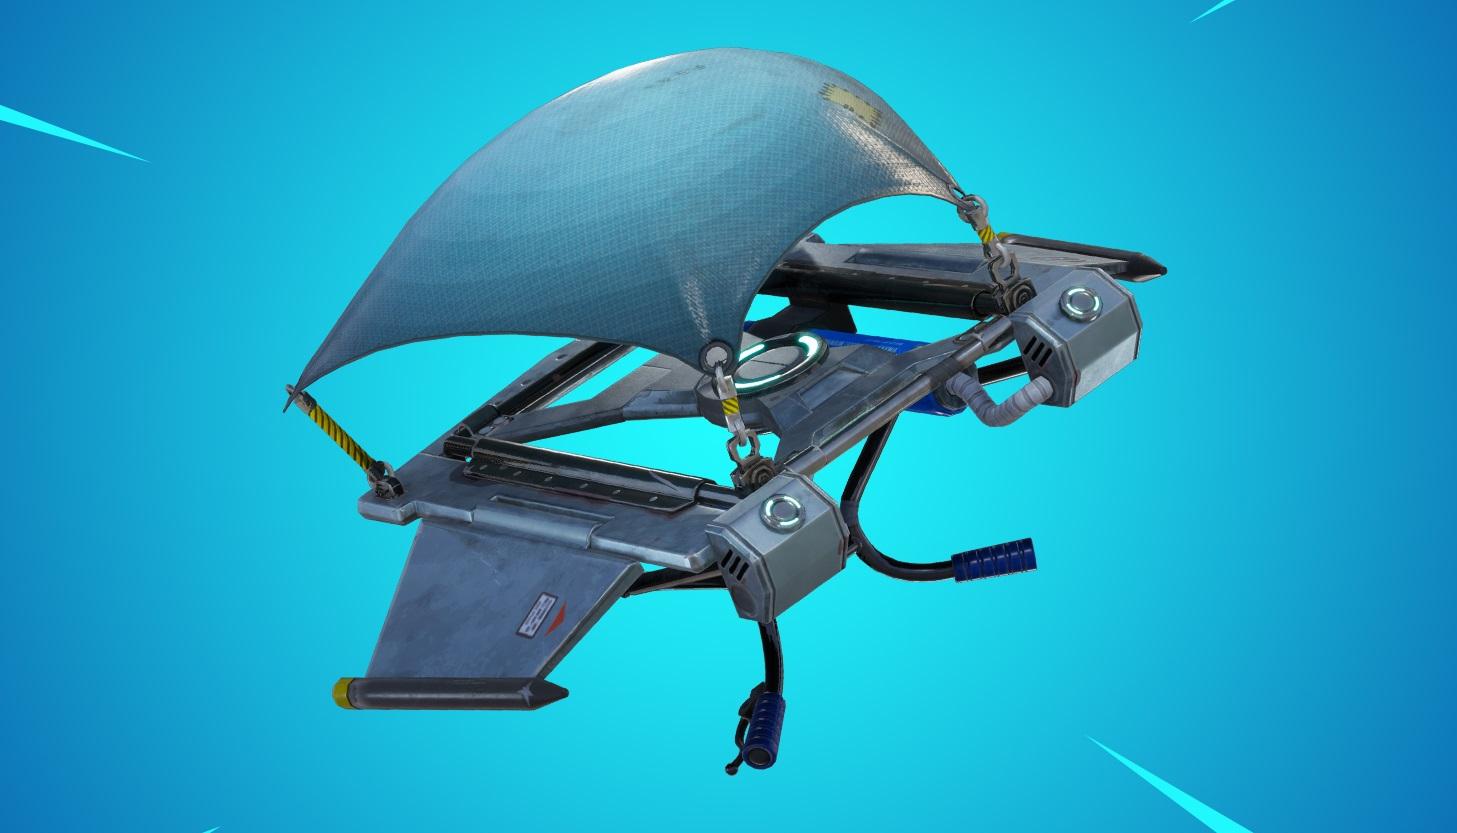 Fortnite update 7.20 brings back glider redeploy as an item